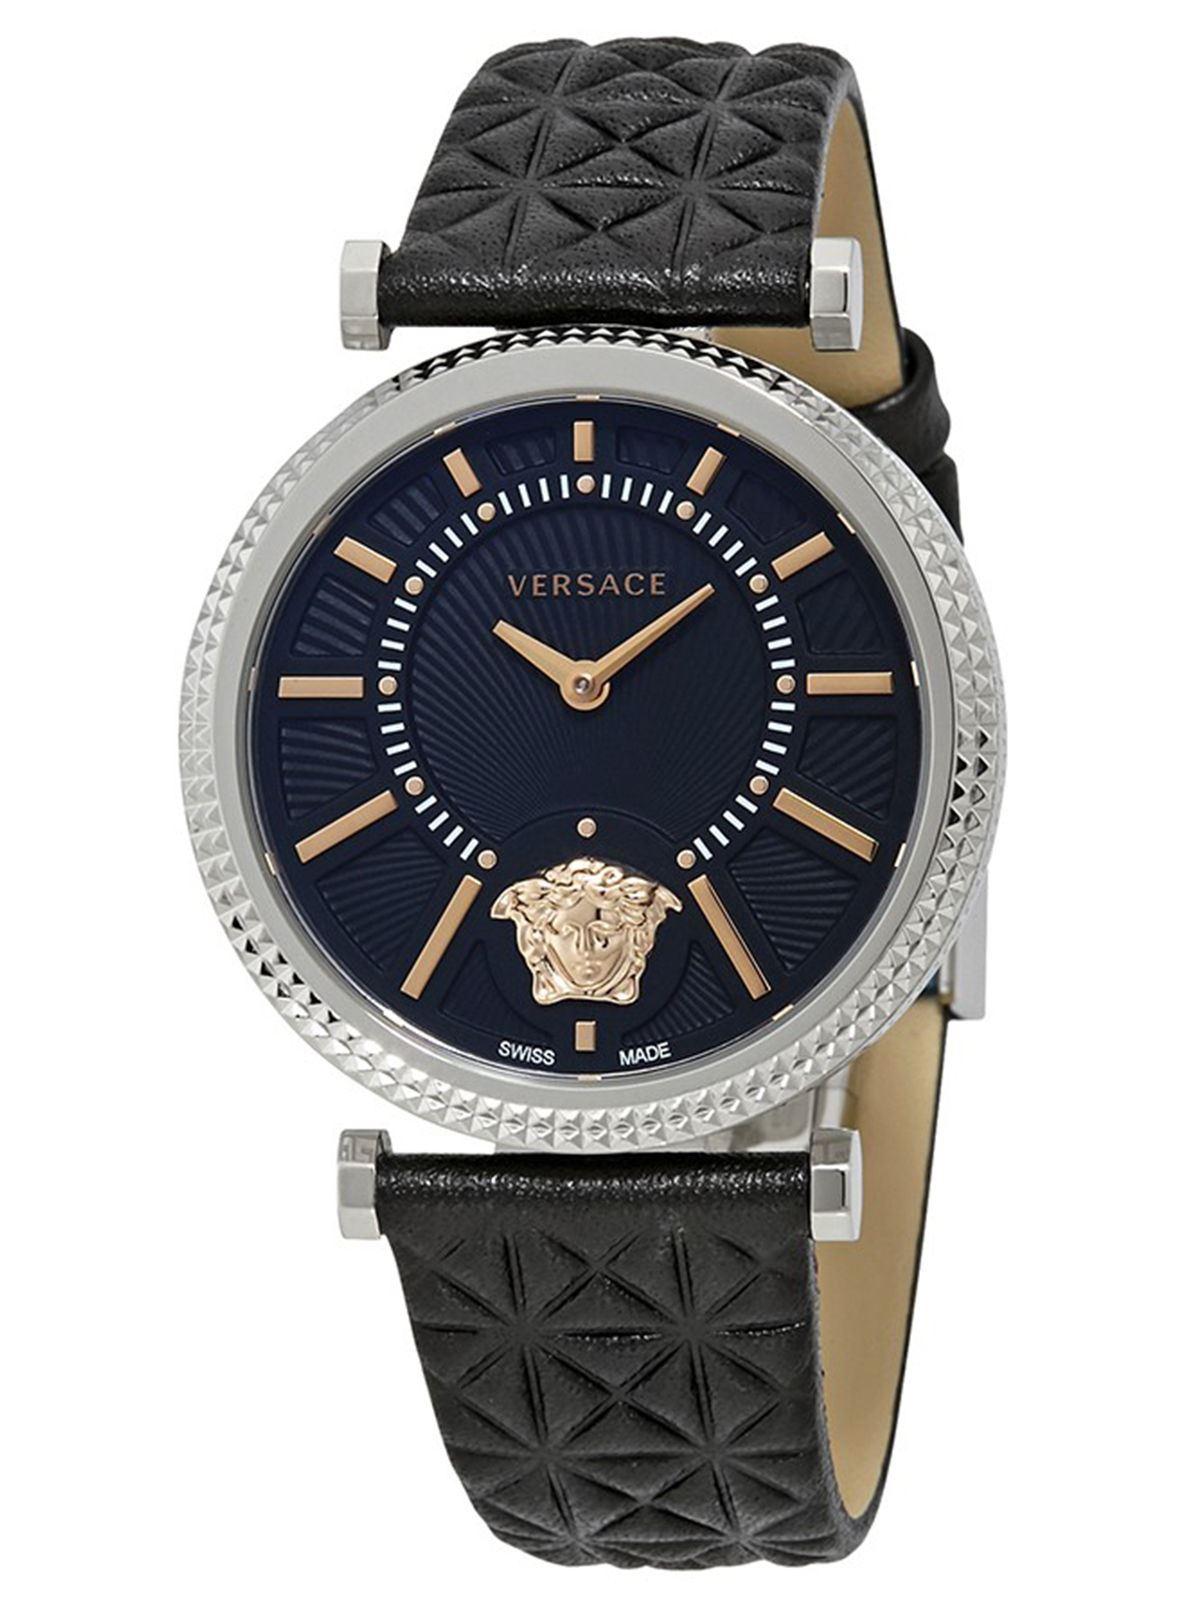 3bc4879935c Versace V-Helix Ladies  Black Leather Watch - VQG020015 ...